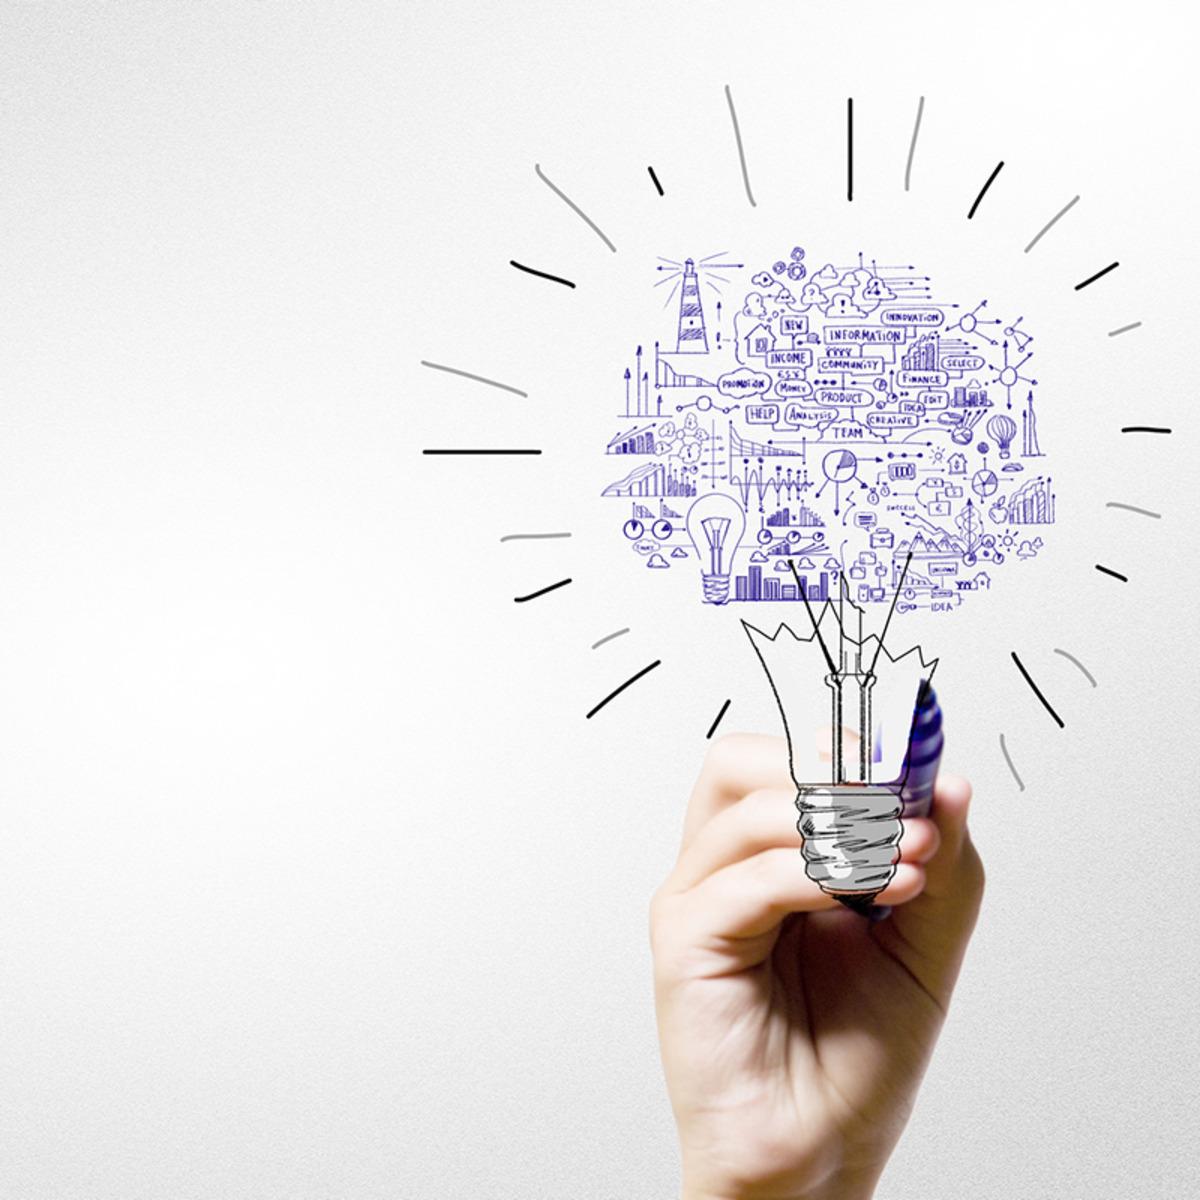 Innovar course image